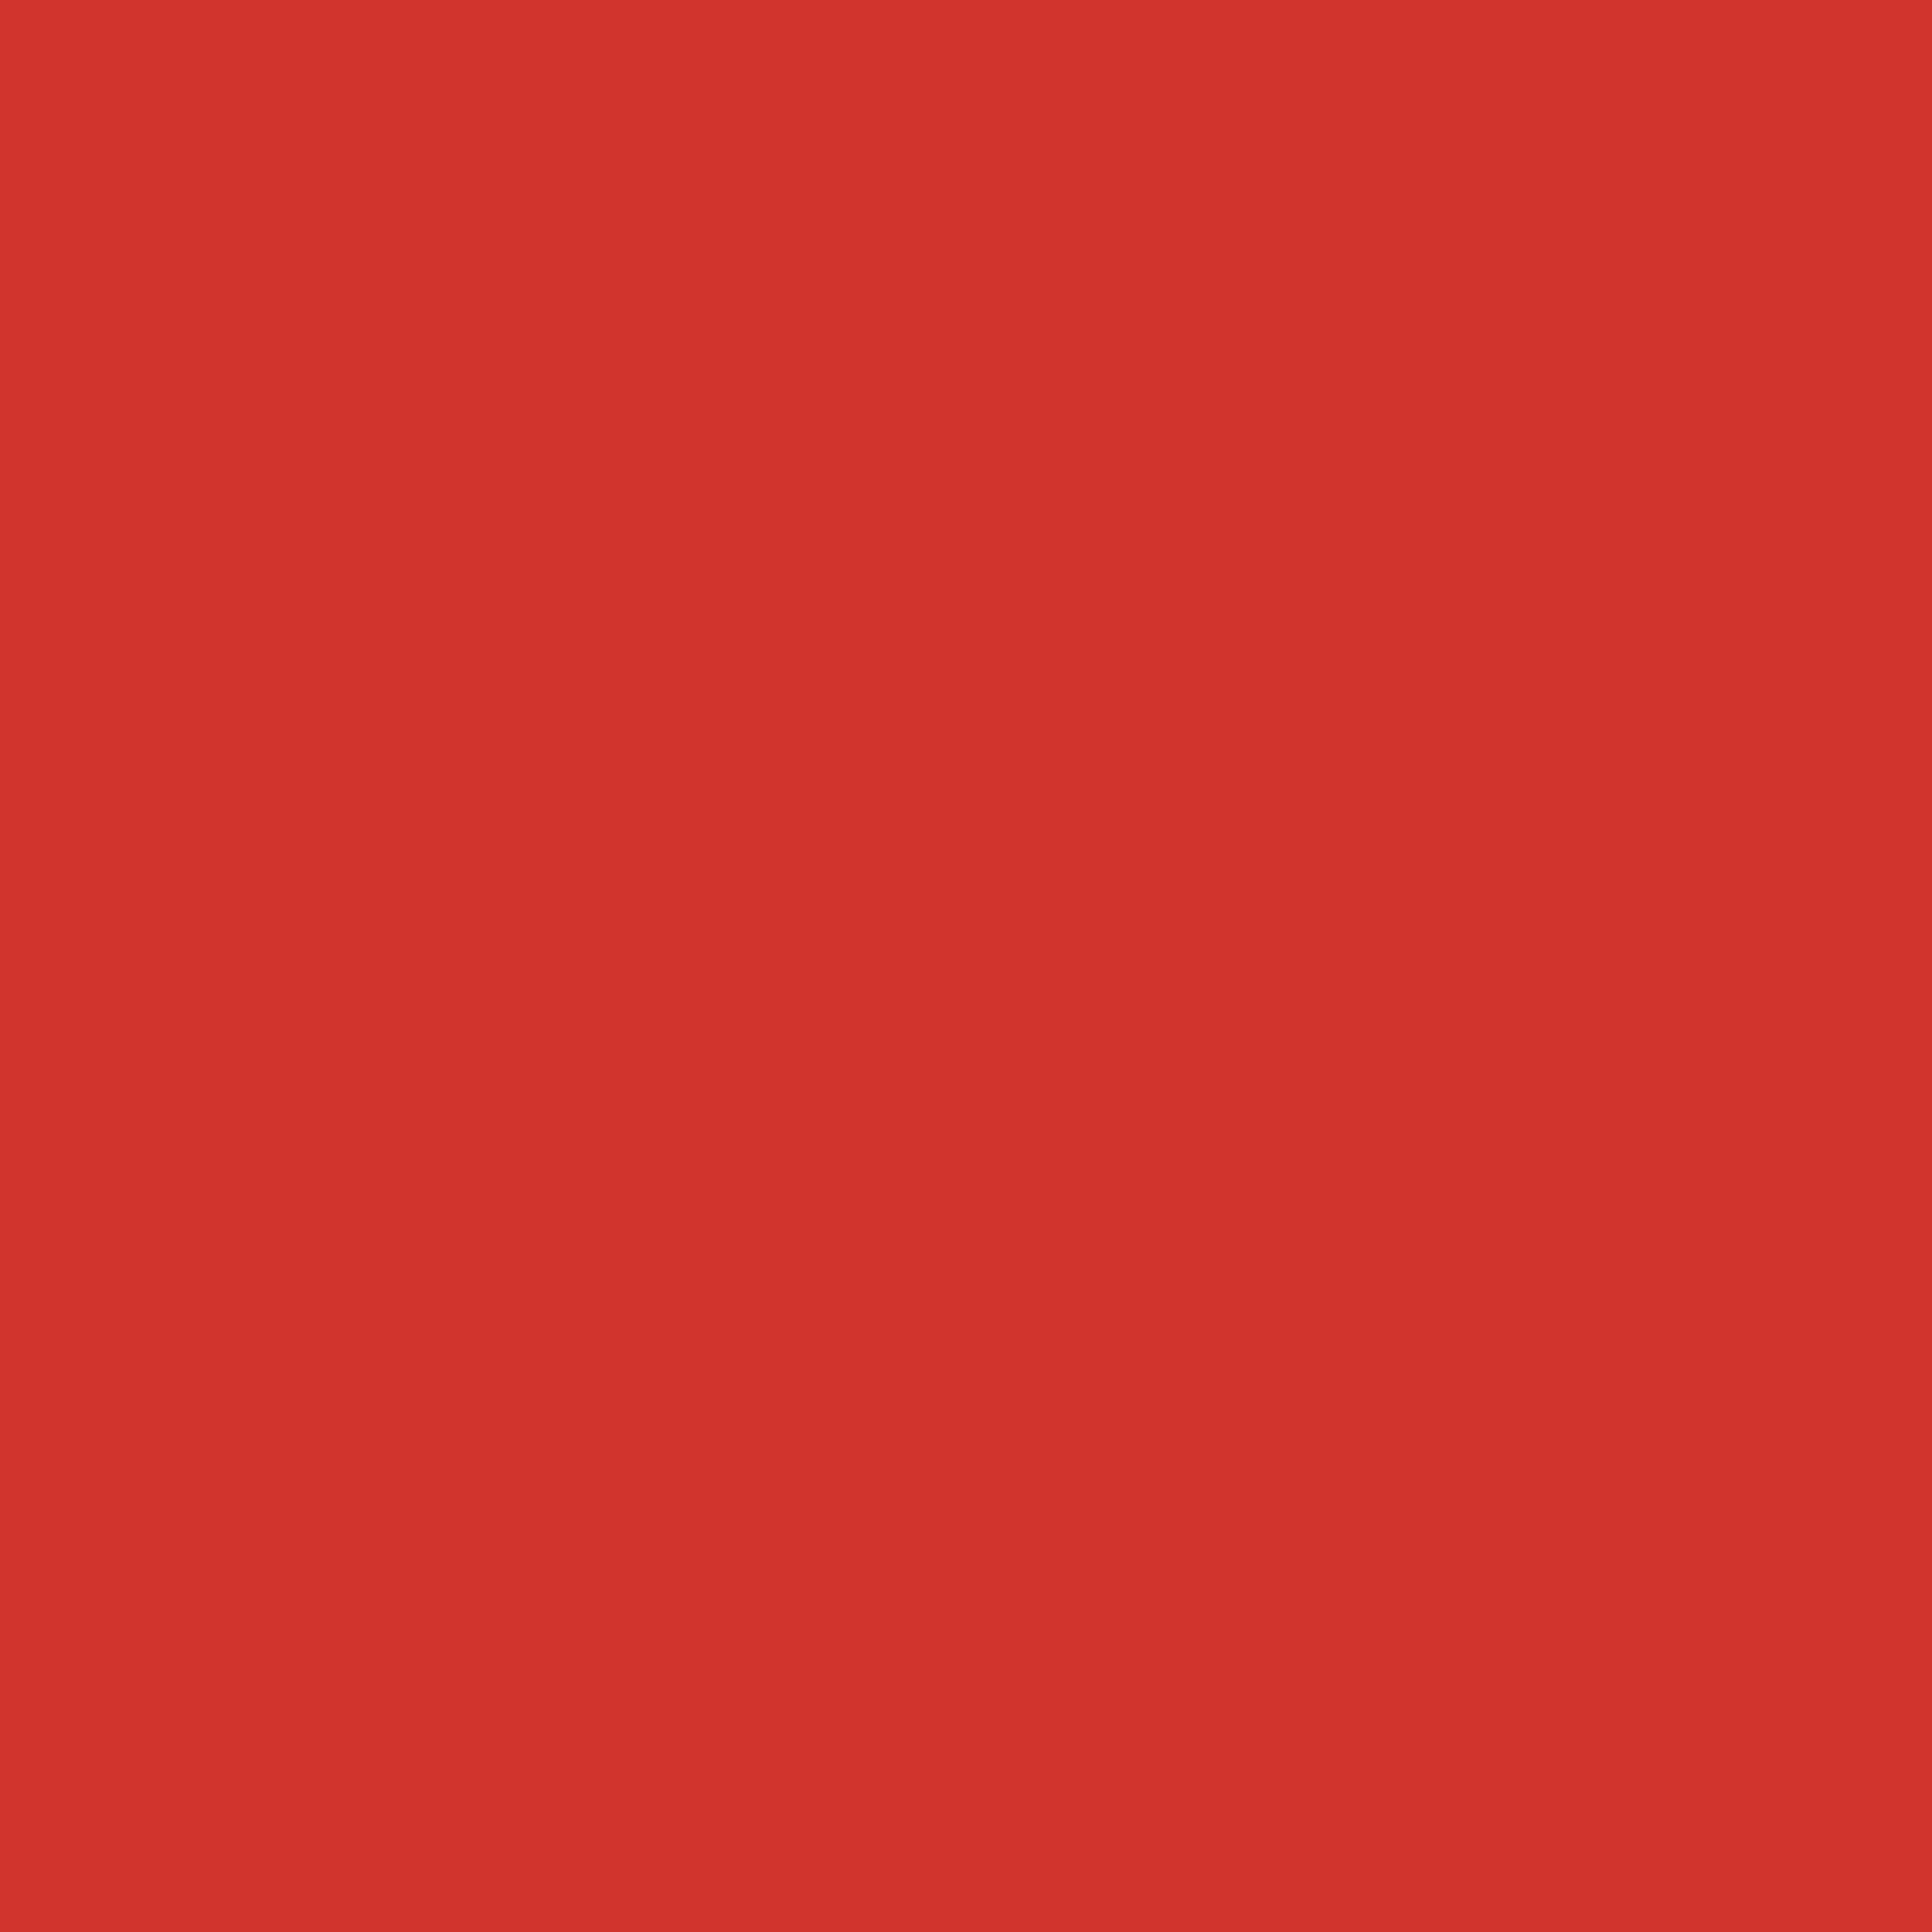 Red, Fiesta